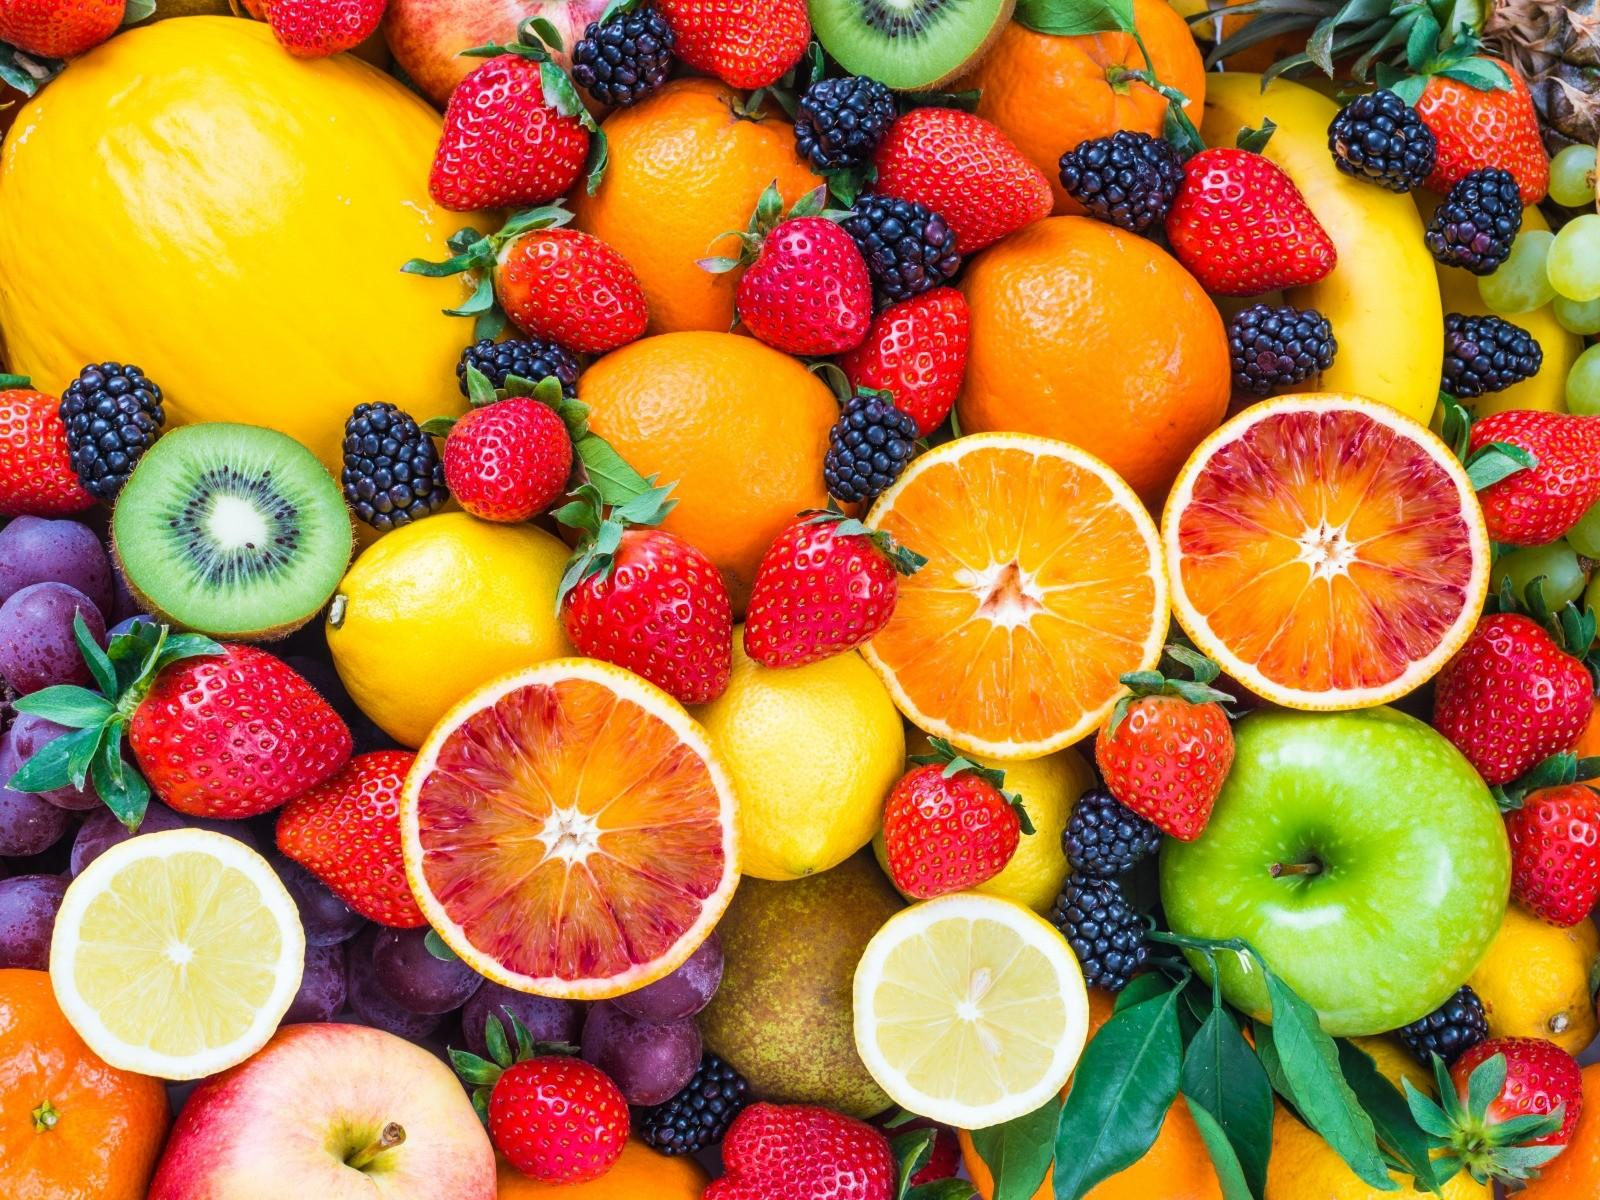 фрукты-аллергены